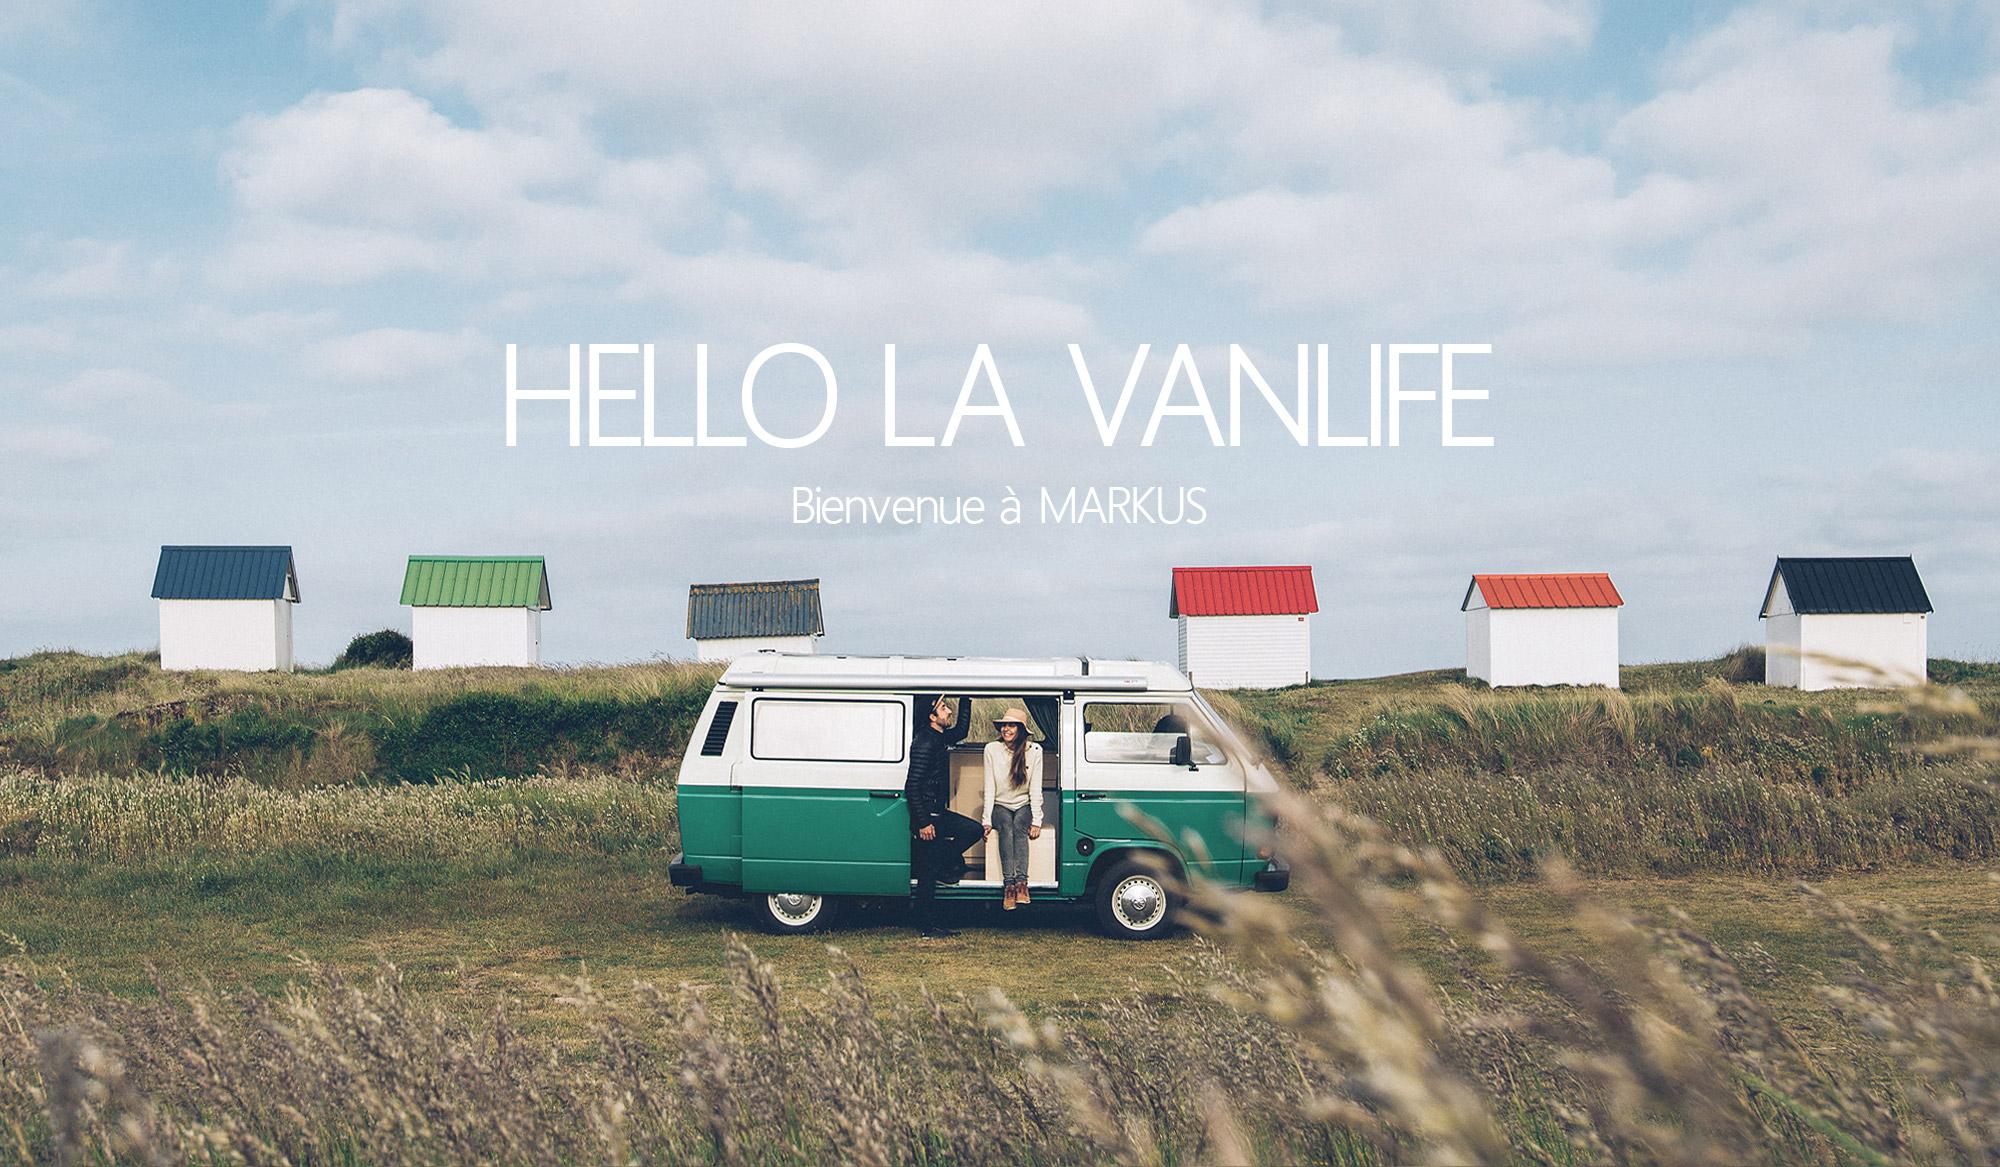 Hello la Vanlife, Bienvenue à Markus